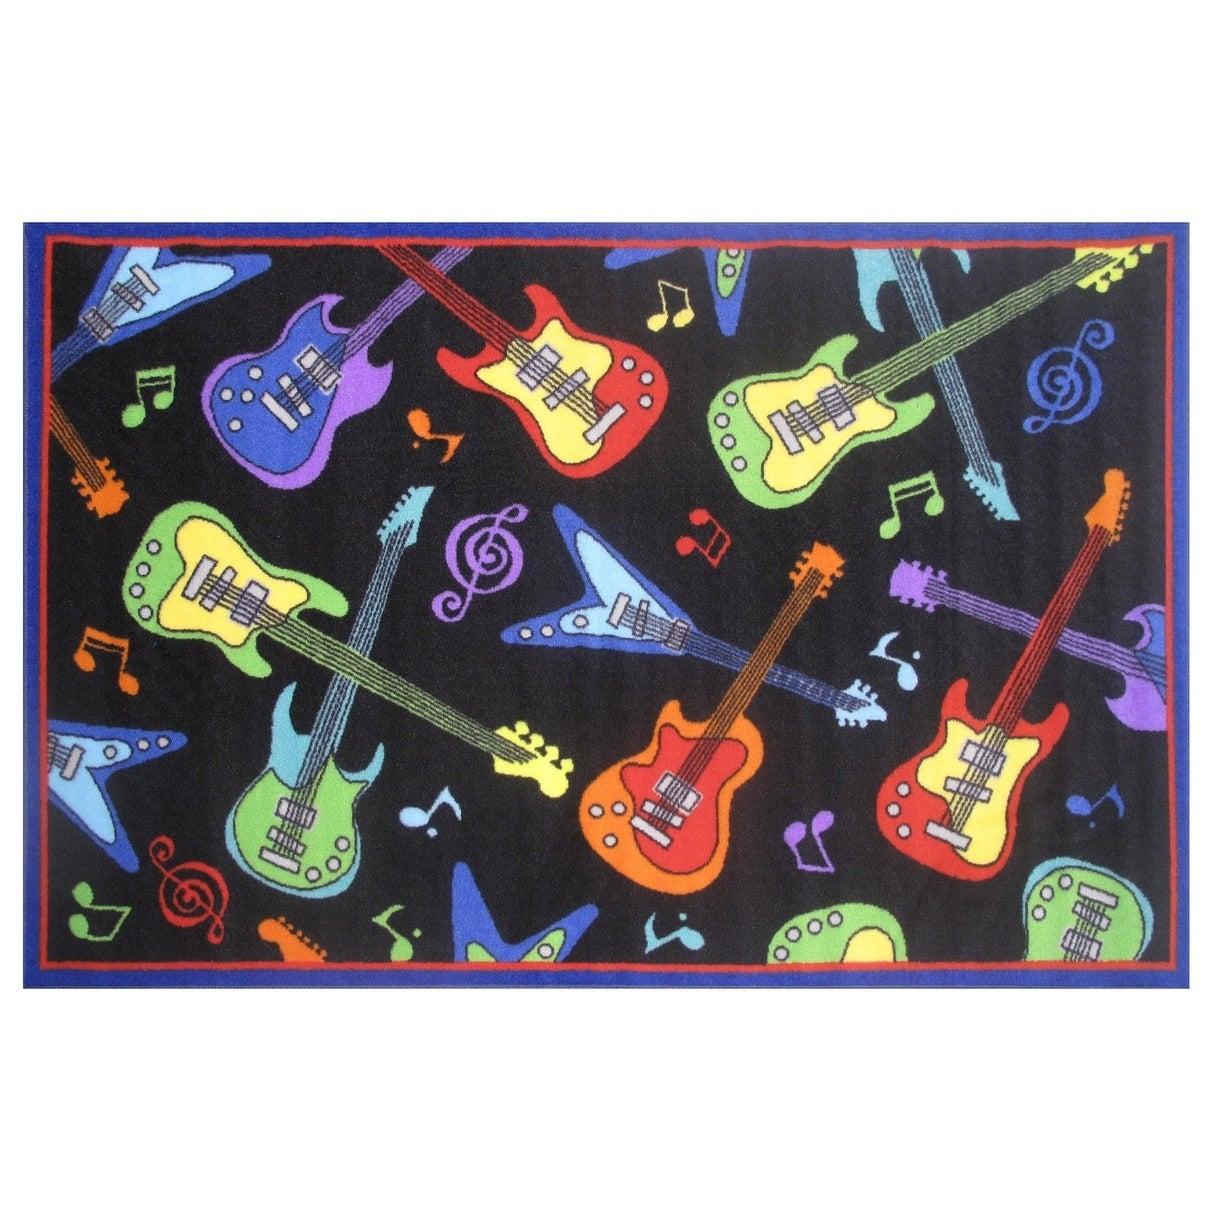 LA RUG Rock Star - Guitar Accent Rug (4'3 x 6'5) (51 inch...